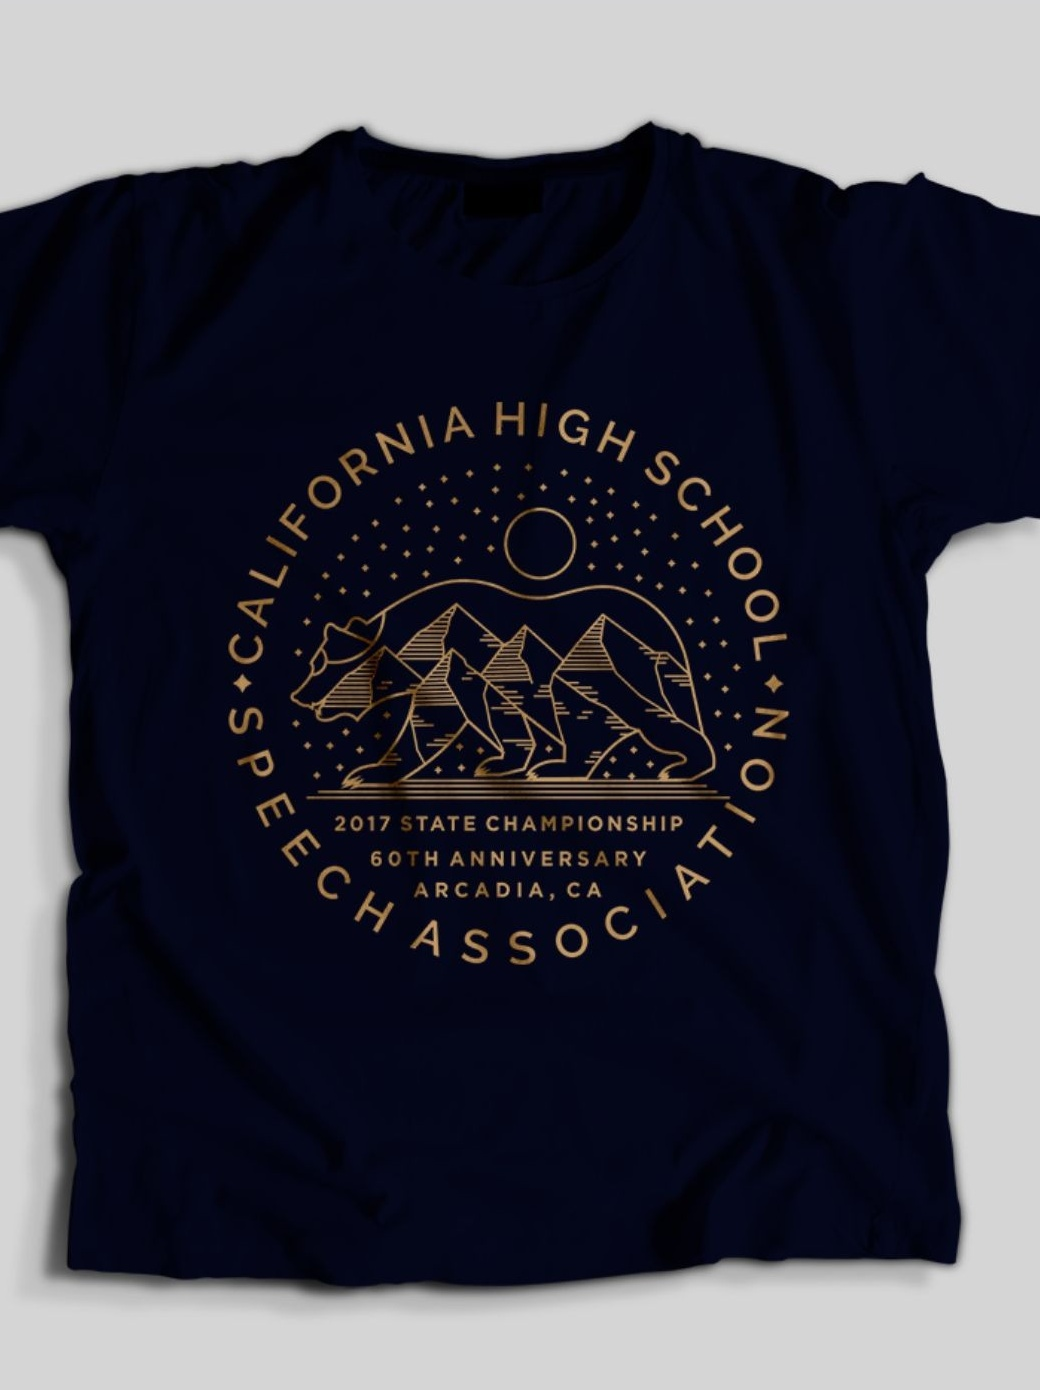 Line art illustration of the California flag for a high school t-shirt